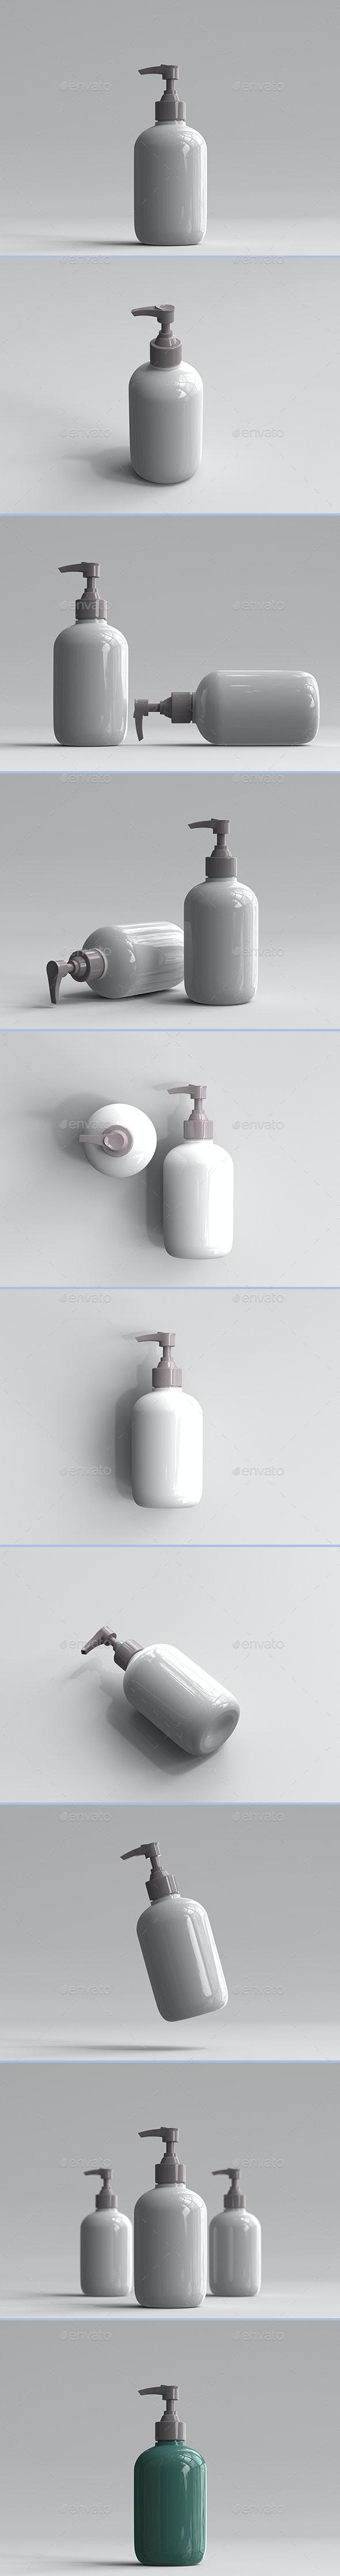 3D Rendered Pump Bottles - Objects 3D Renders